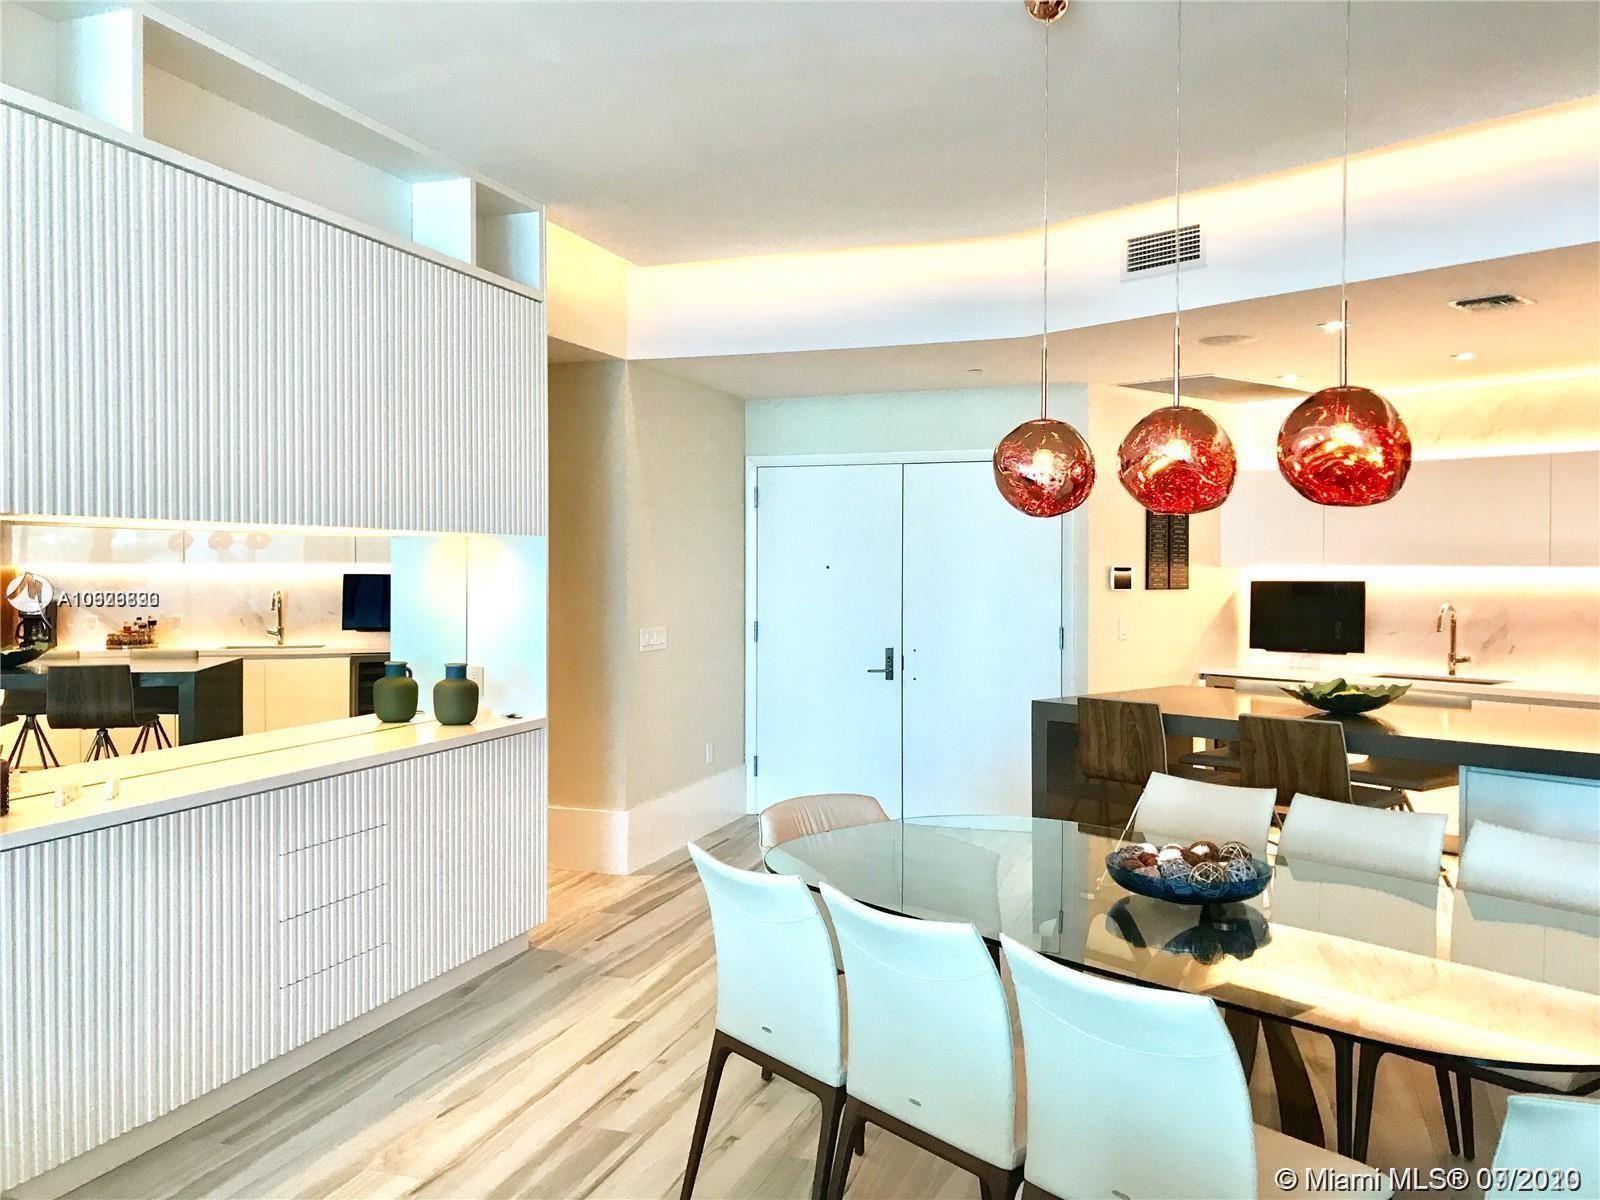 Photo of 701 N Fort Lauderdale Blvd #403, Fort Lauderdale, FL 33304 (MLS # A10929890)